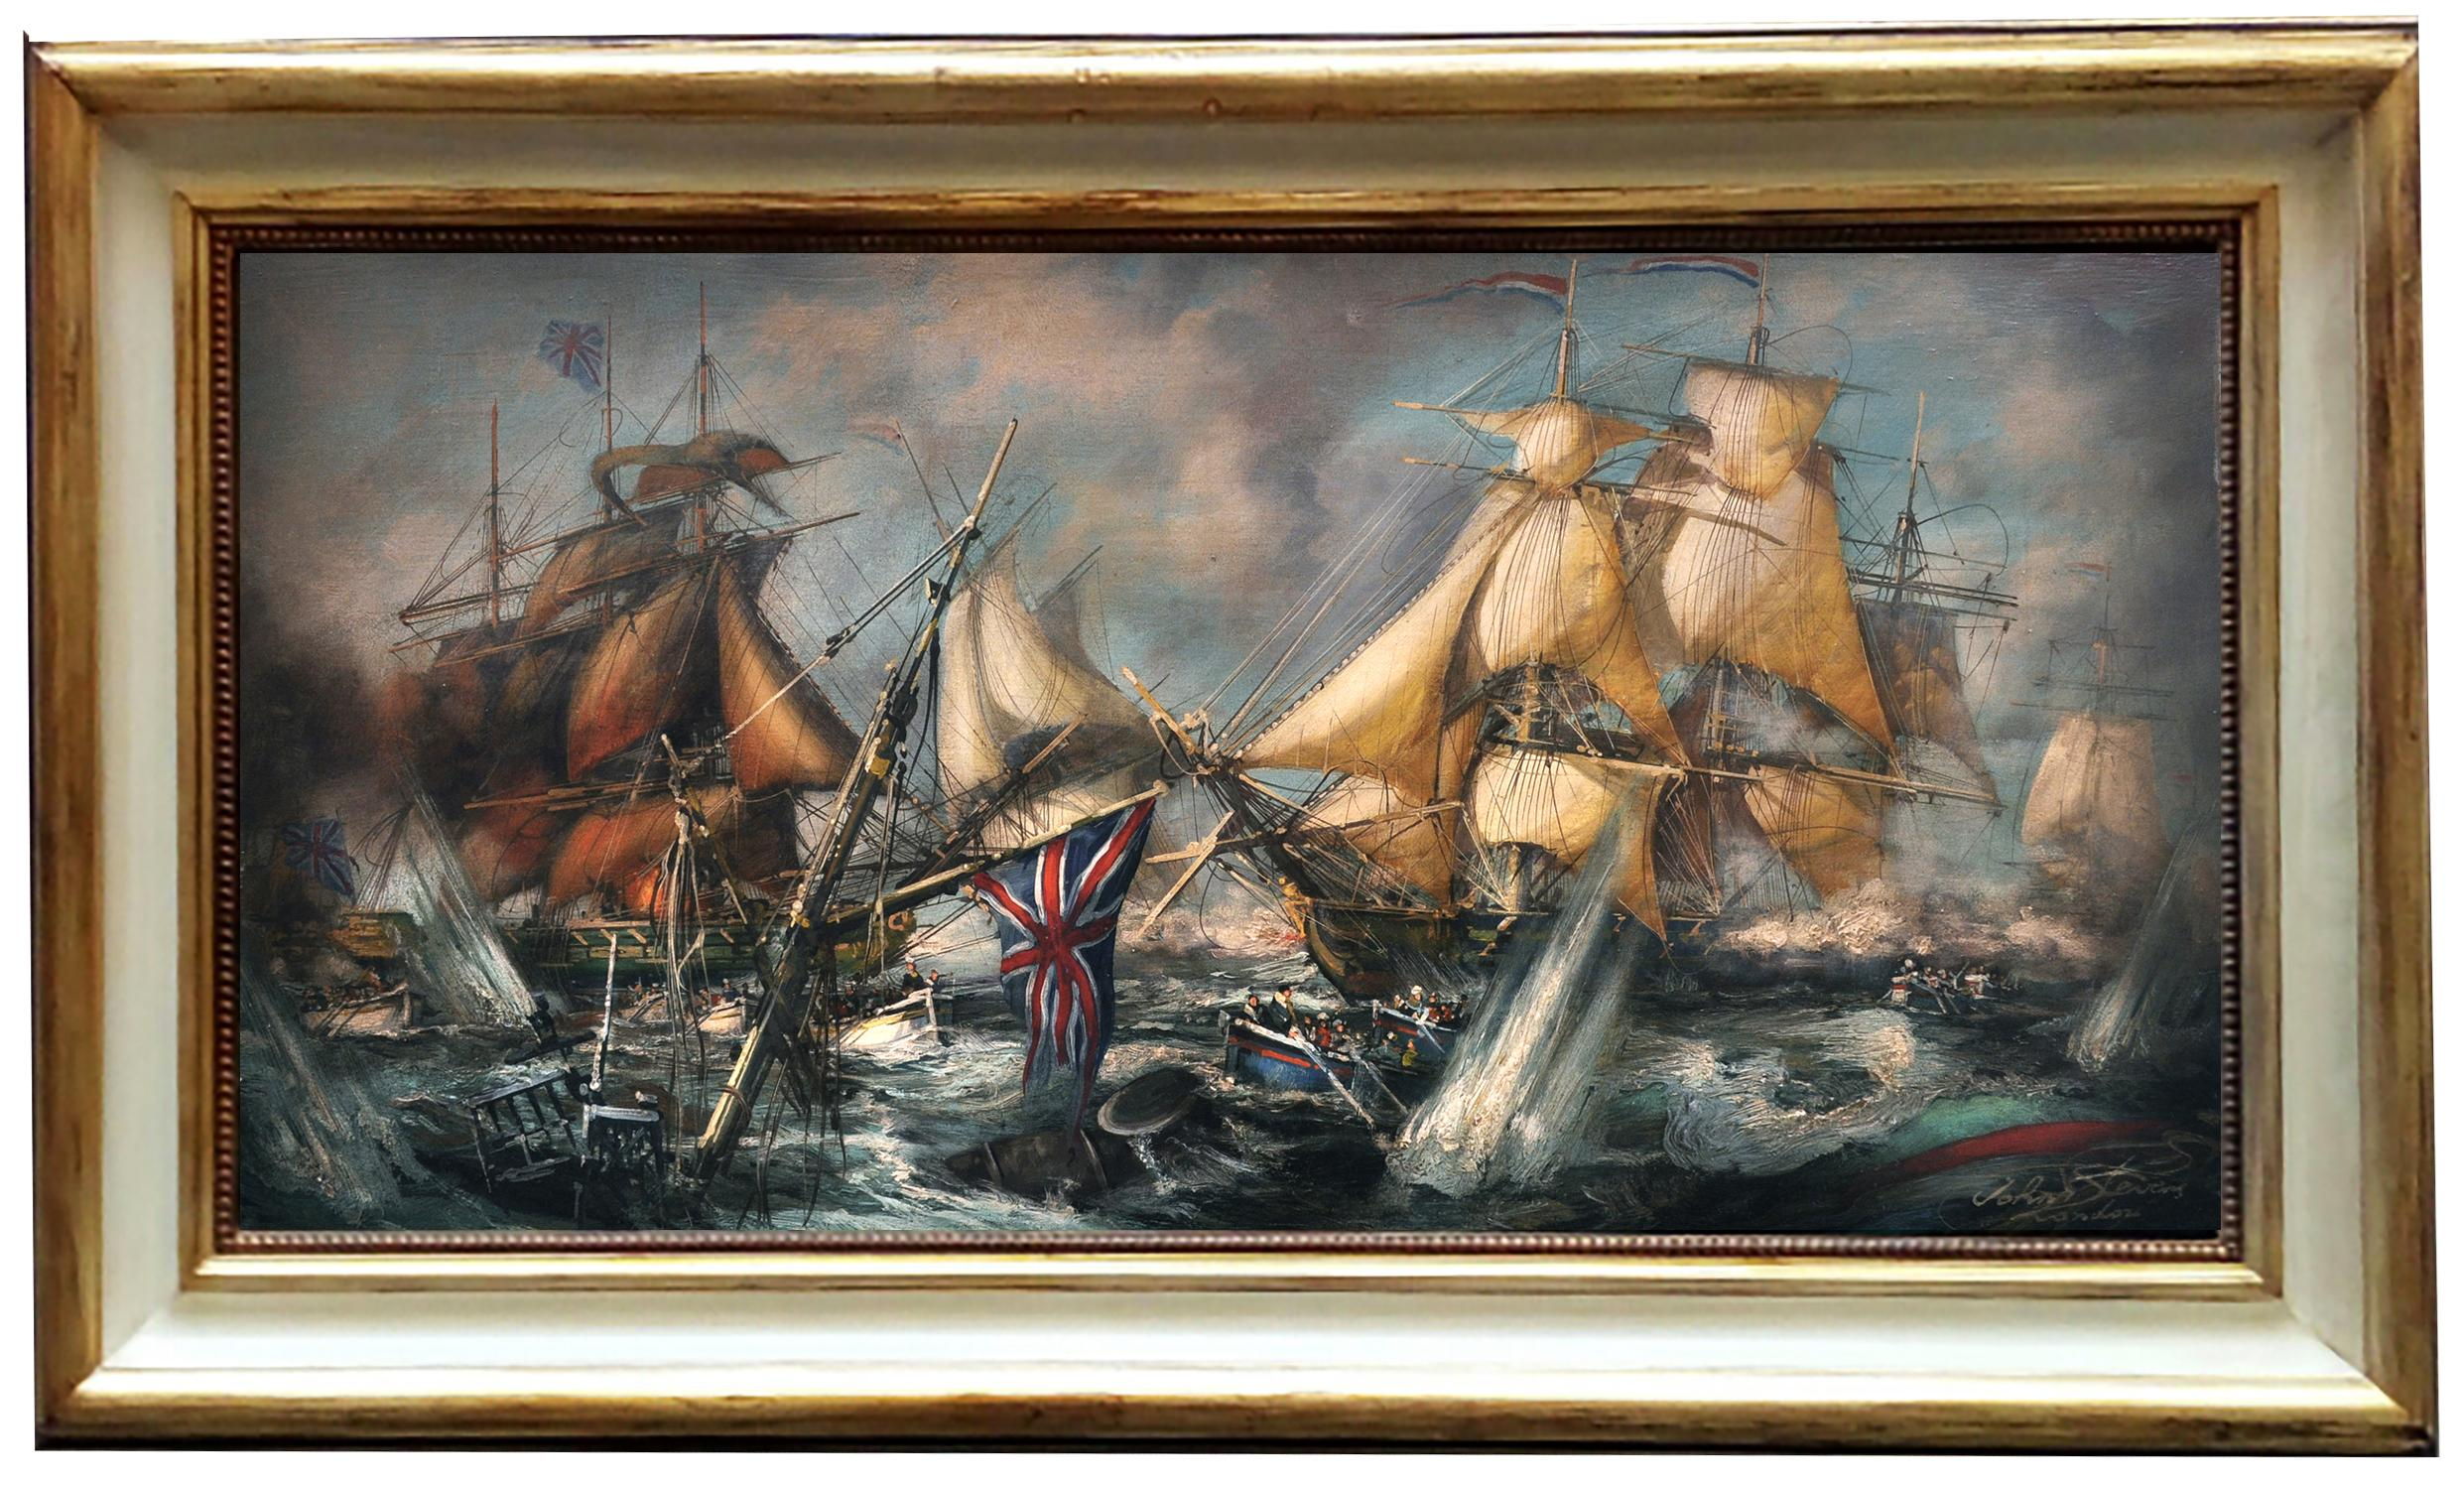 SEA BATTLE - English School -  Italian Sealing Boat Oil on Canvas Painting